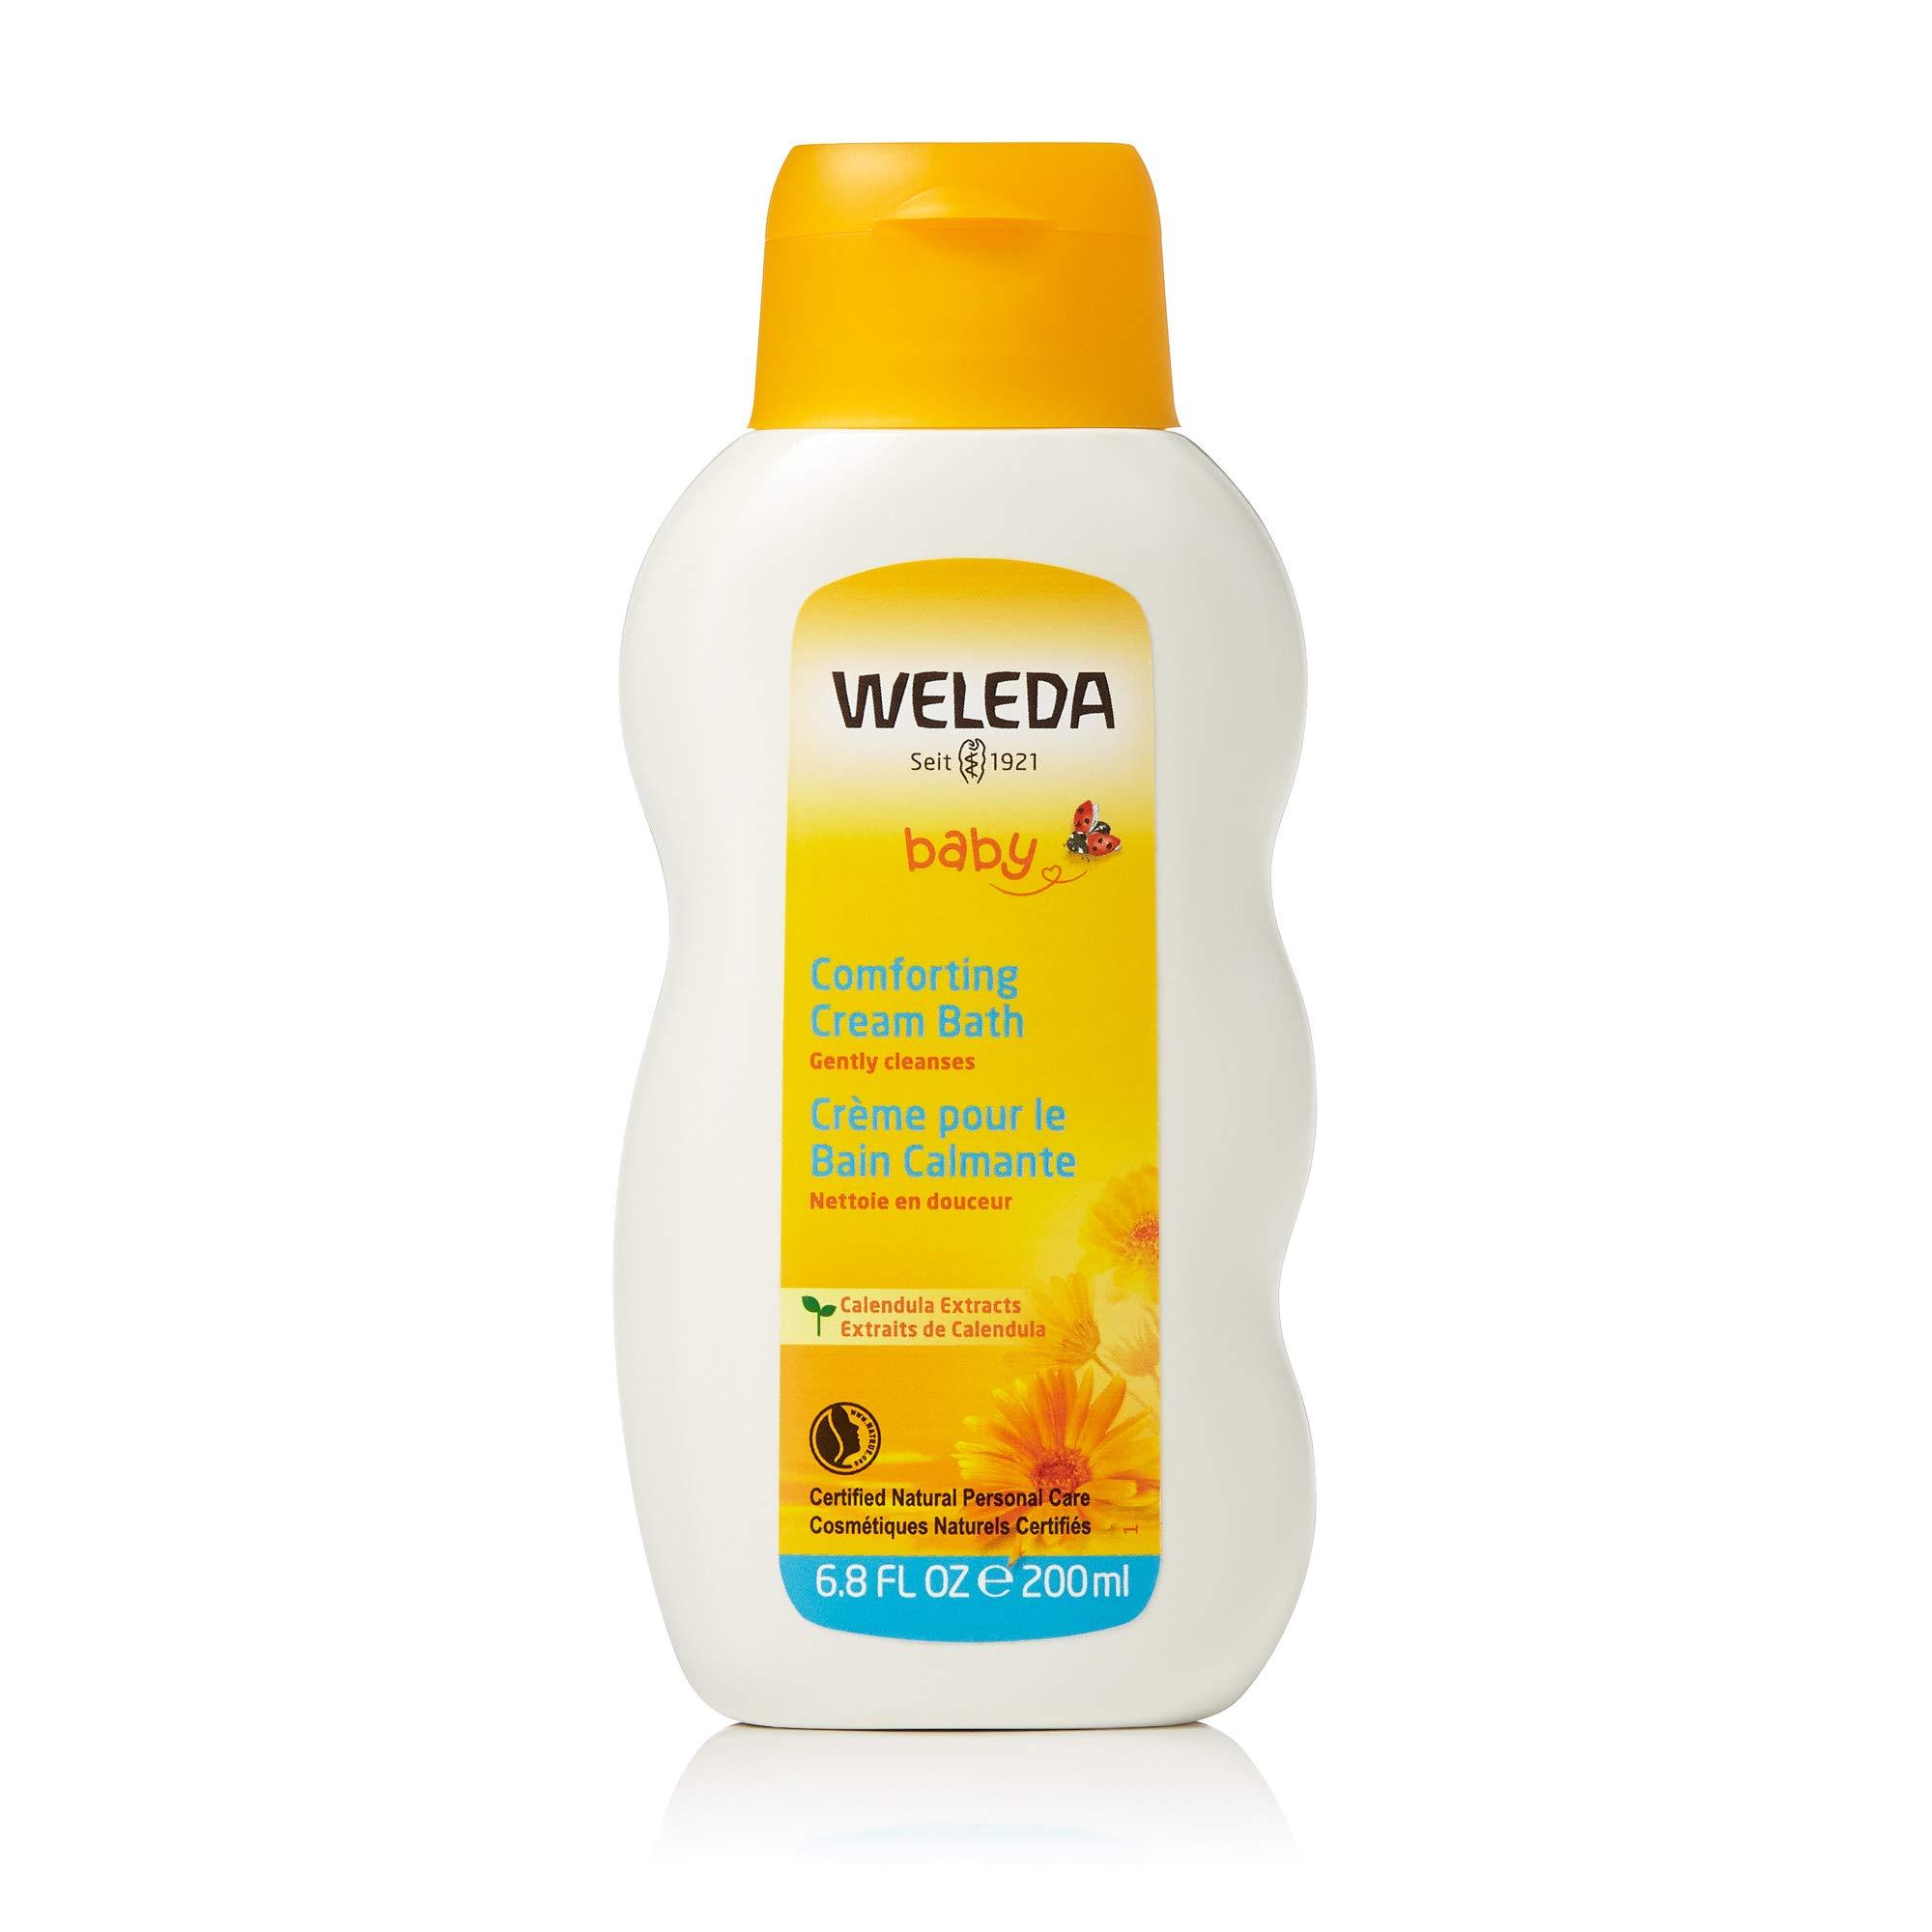 Weleda Calendula Baby Cream Bath, 6.8 Fl Oz